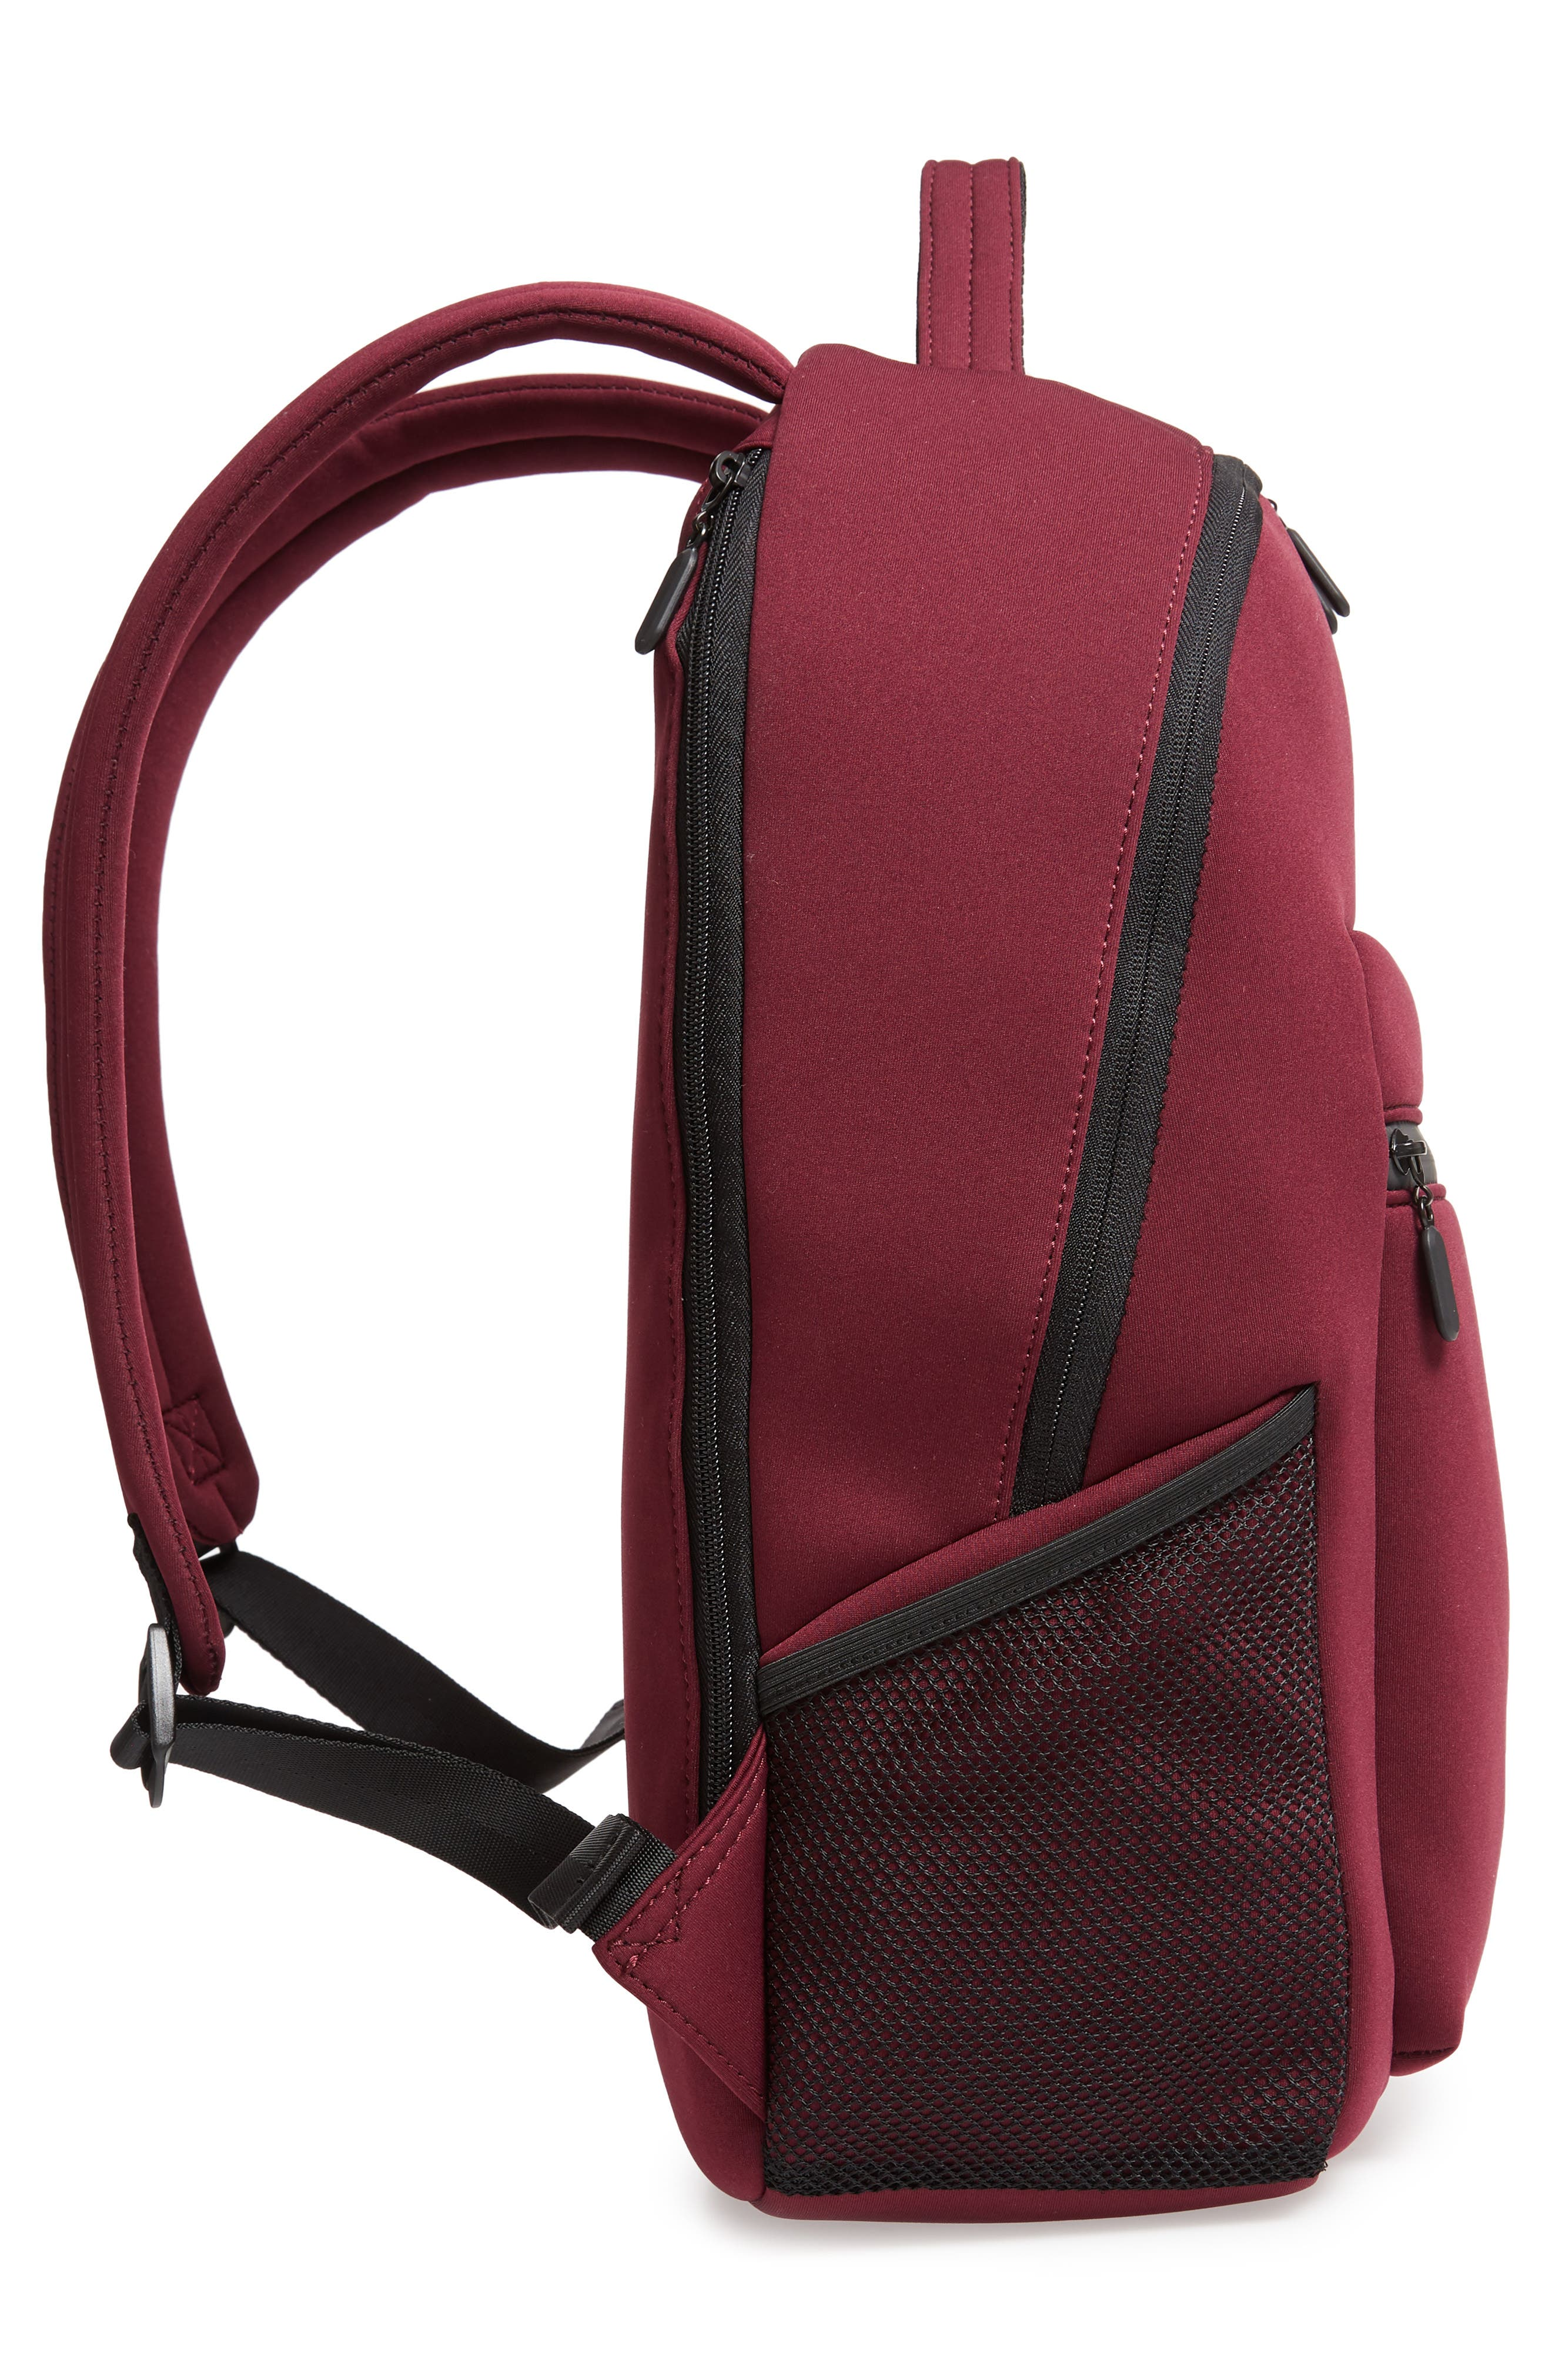 Baseline Backpack,                             Alternate thumbnail 5, color,                             RED TANNIN